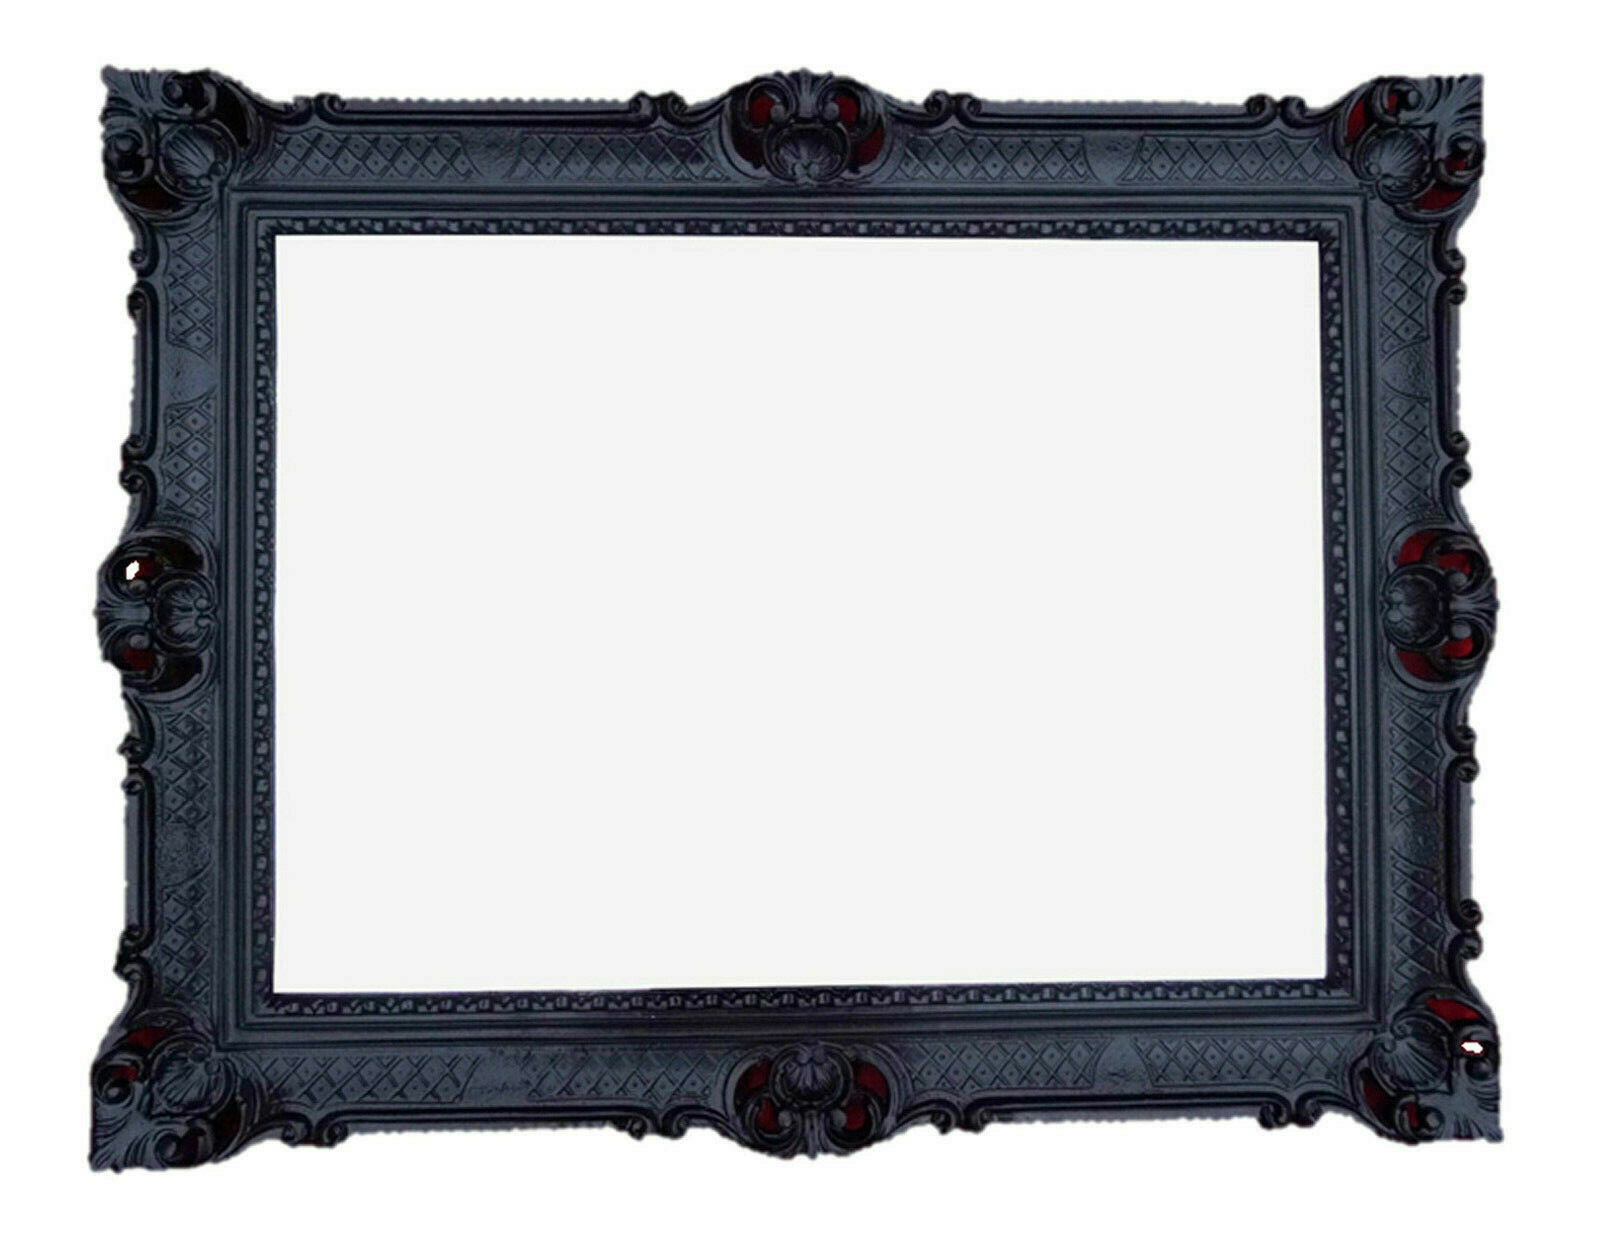 Cadre photo 90x70 Noir Antique baroque rococo cadre photo repro Déco image